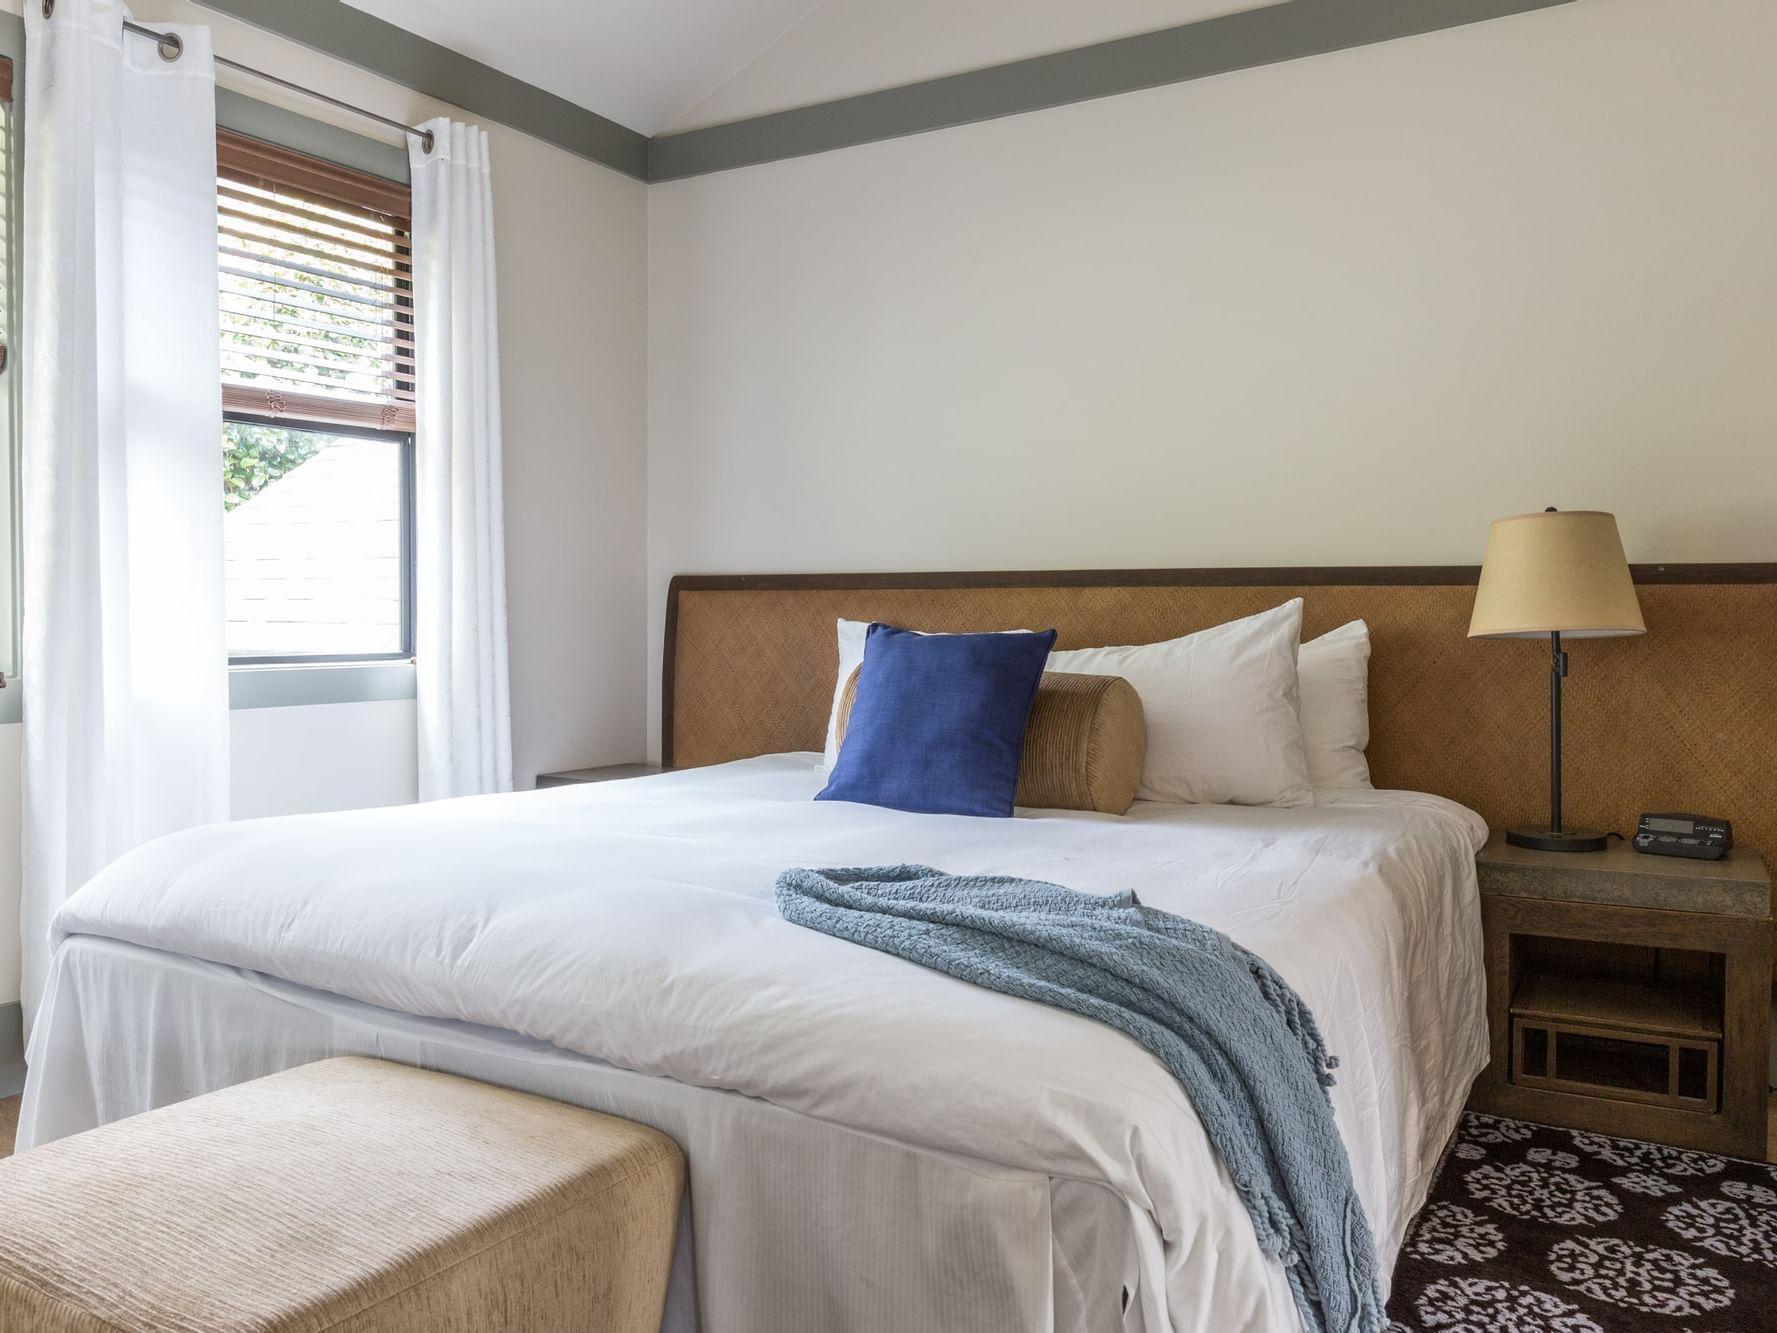 Bedroom of Two Bedroom Suite at Heritage House Resort